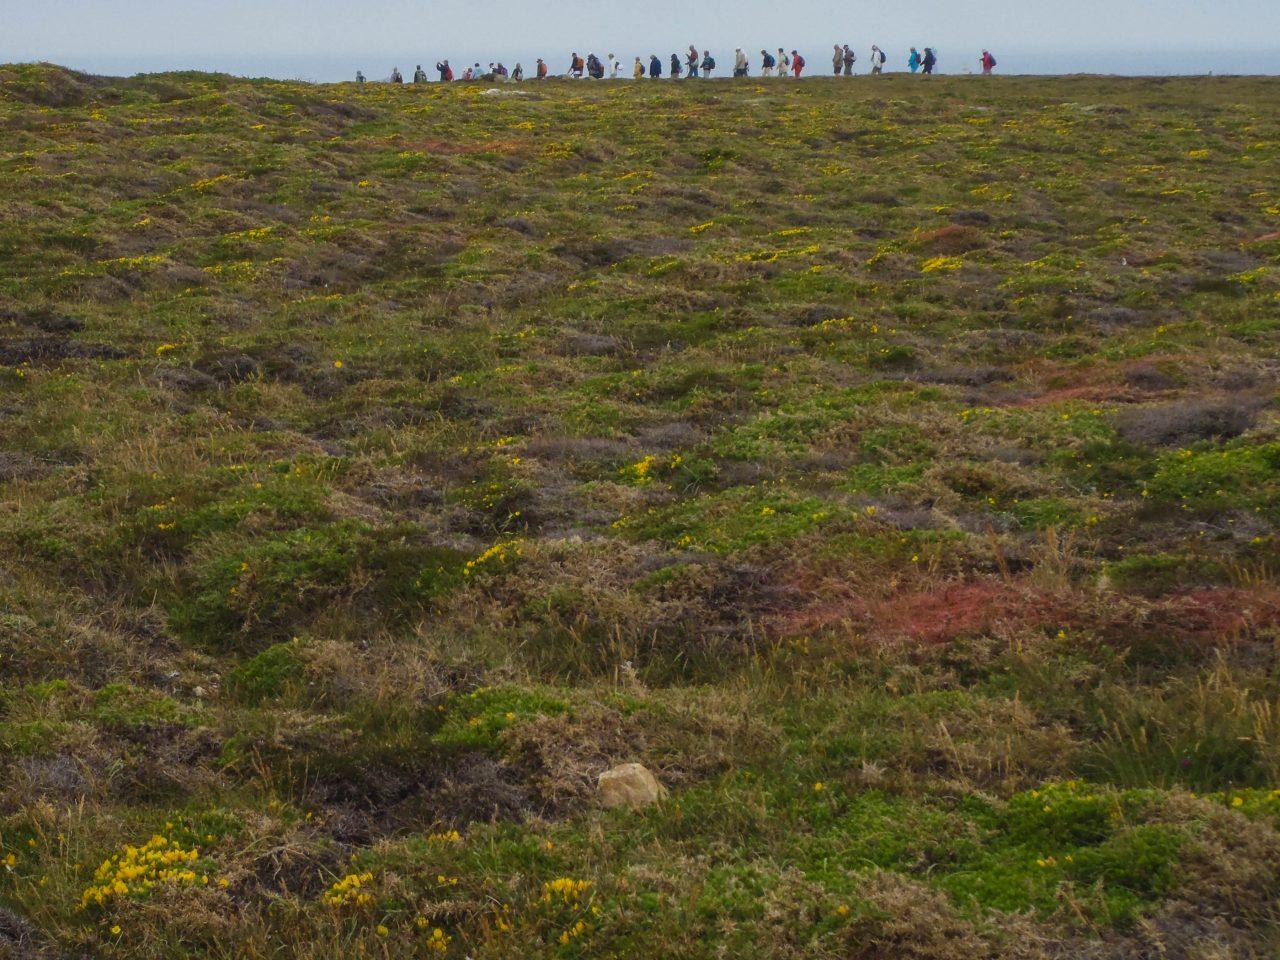 walks along the coast for 1200 kilometres